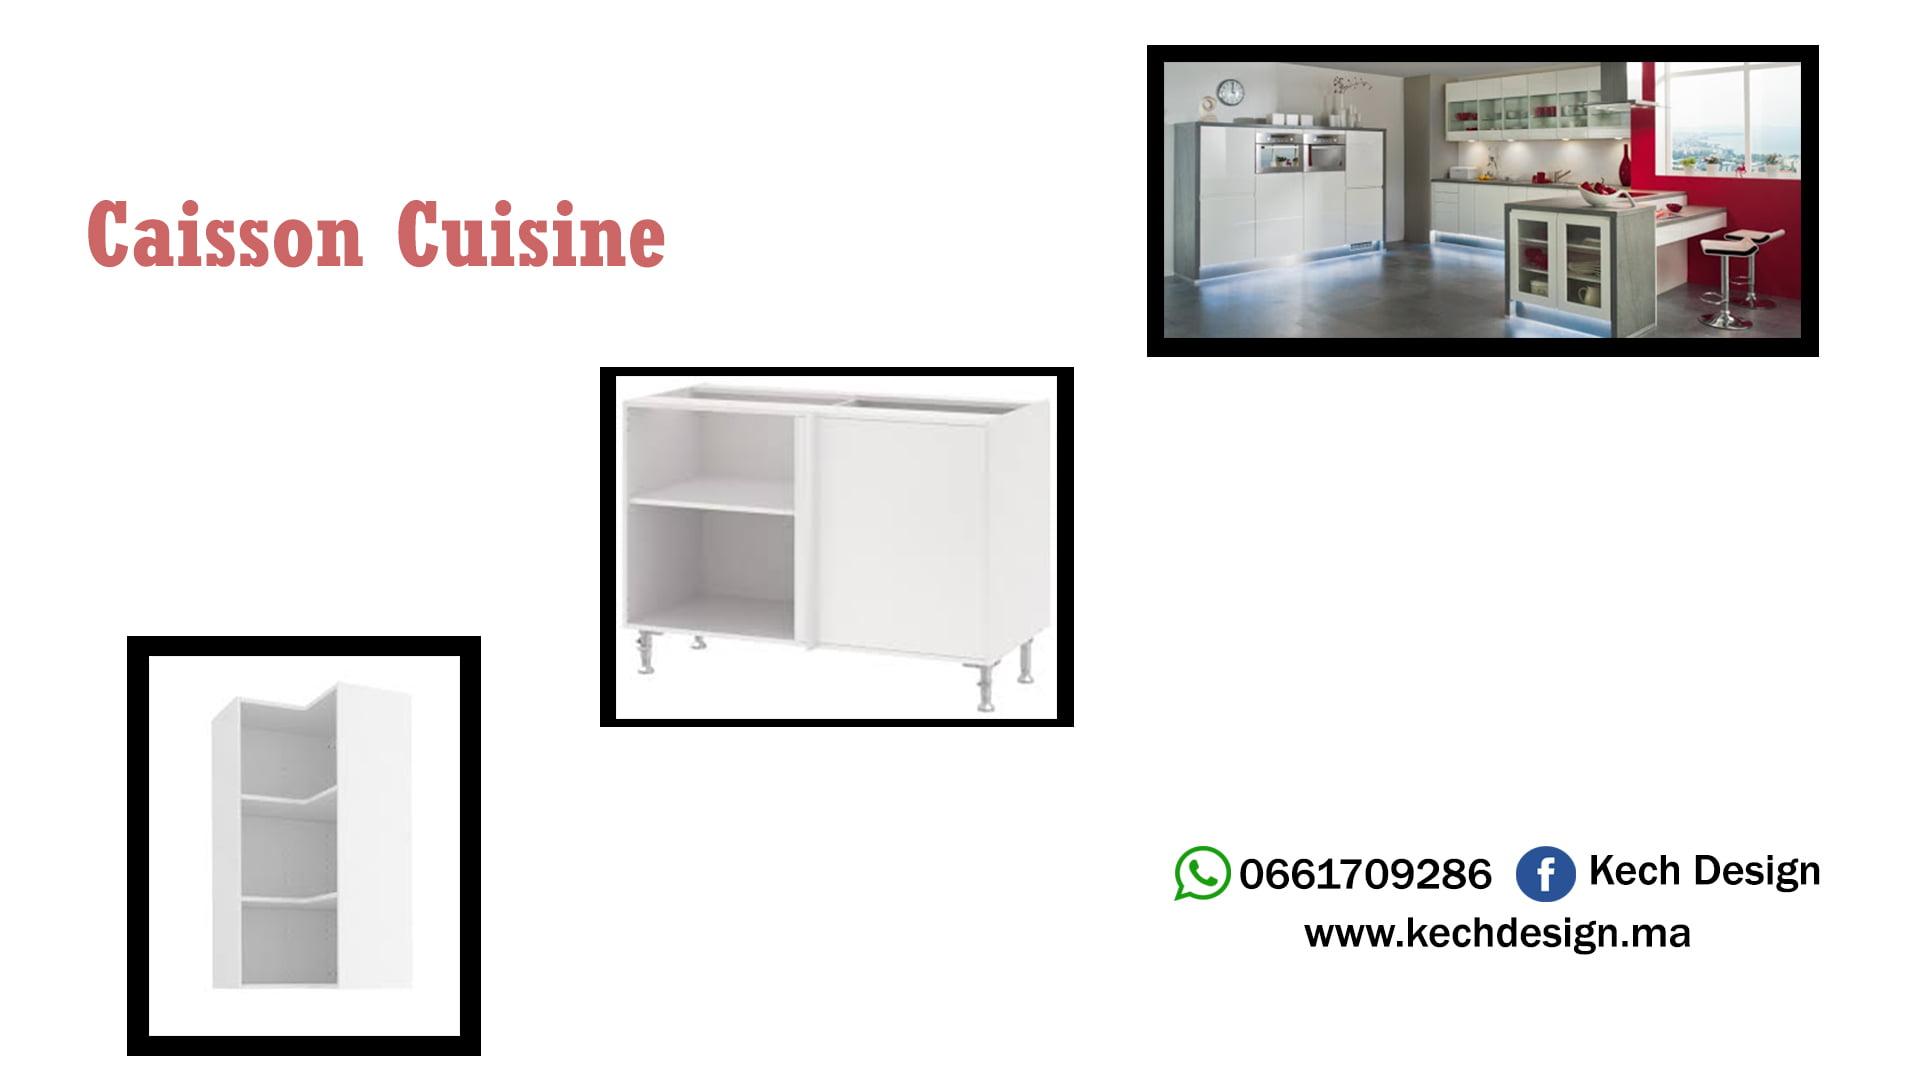 caisson cuisine